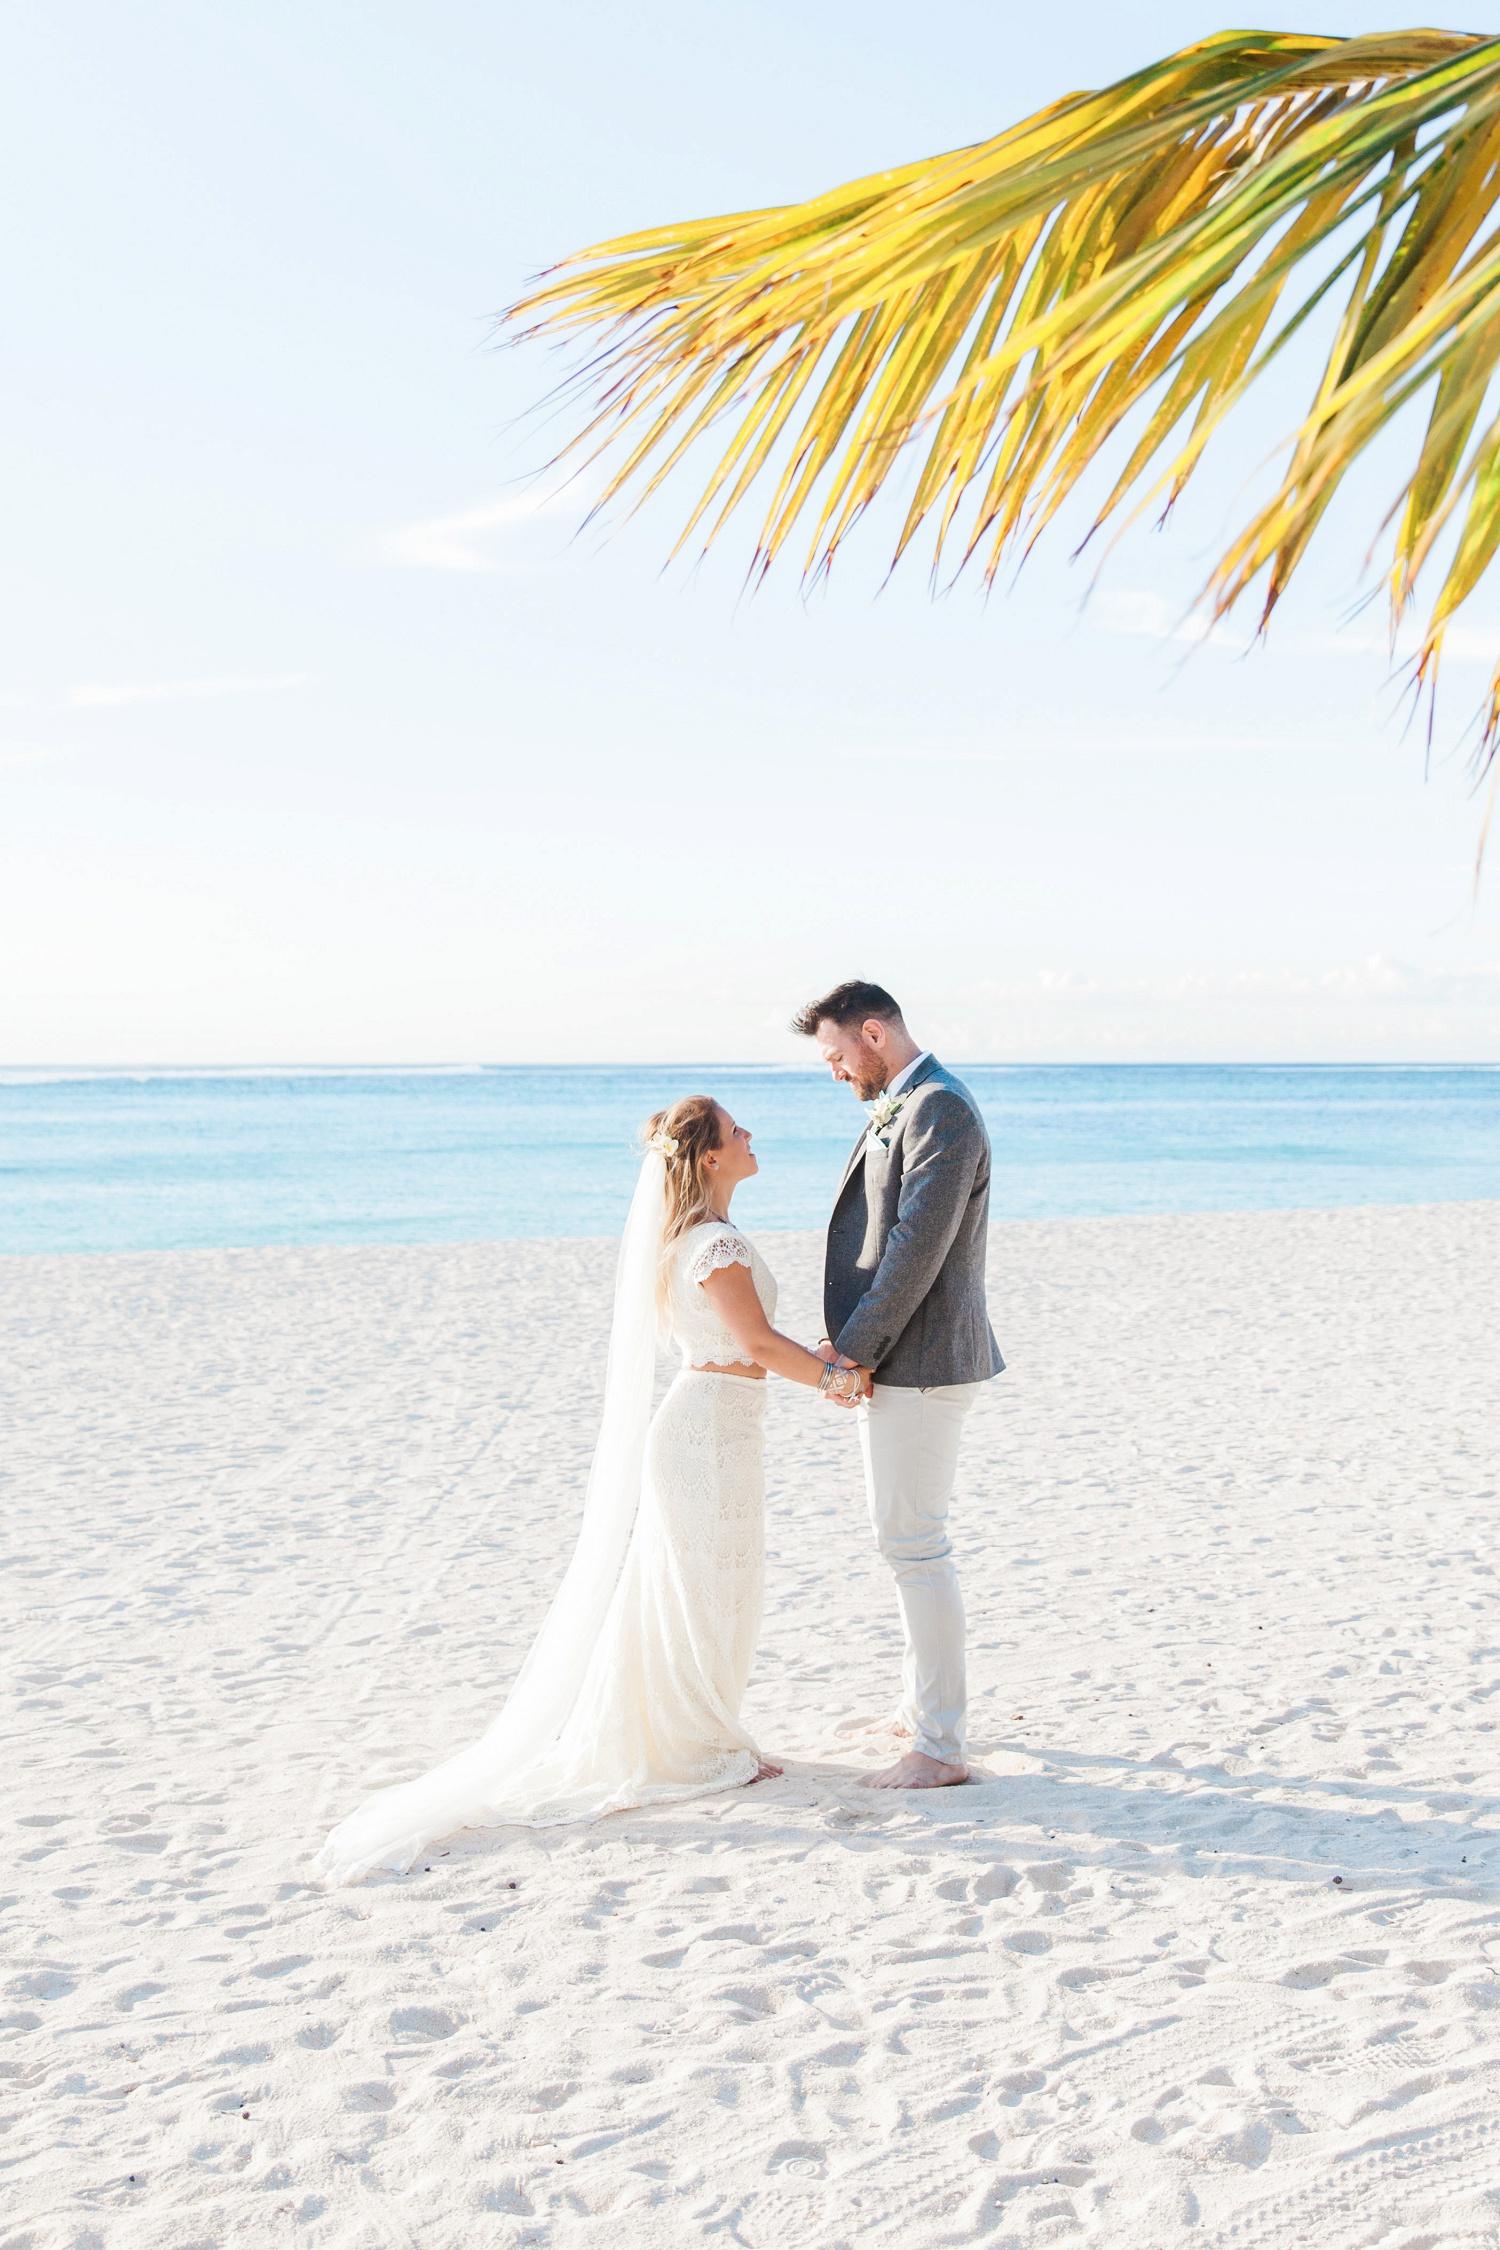 Mauritius wedding photographer testimonial